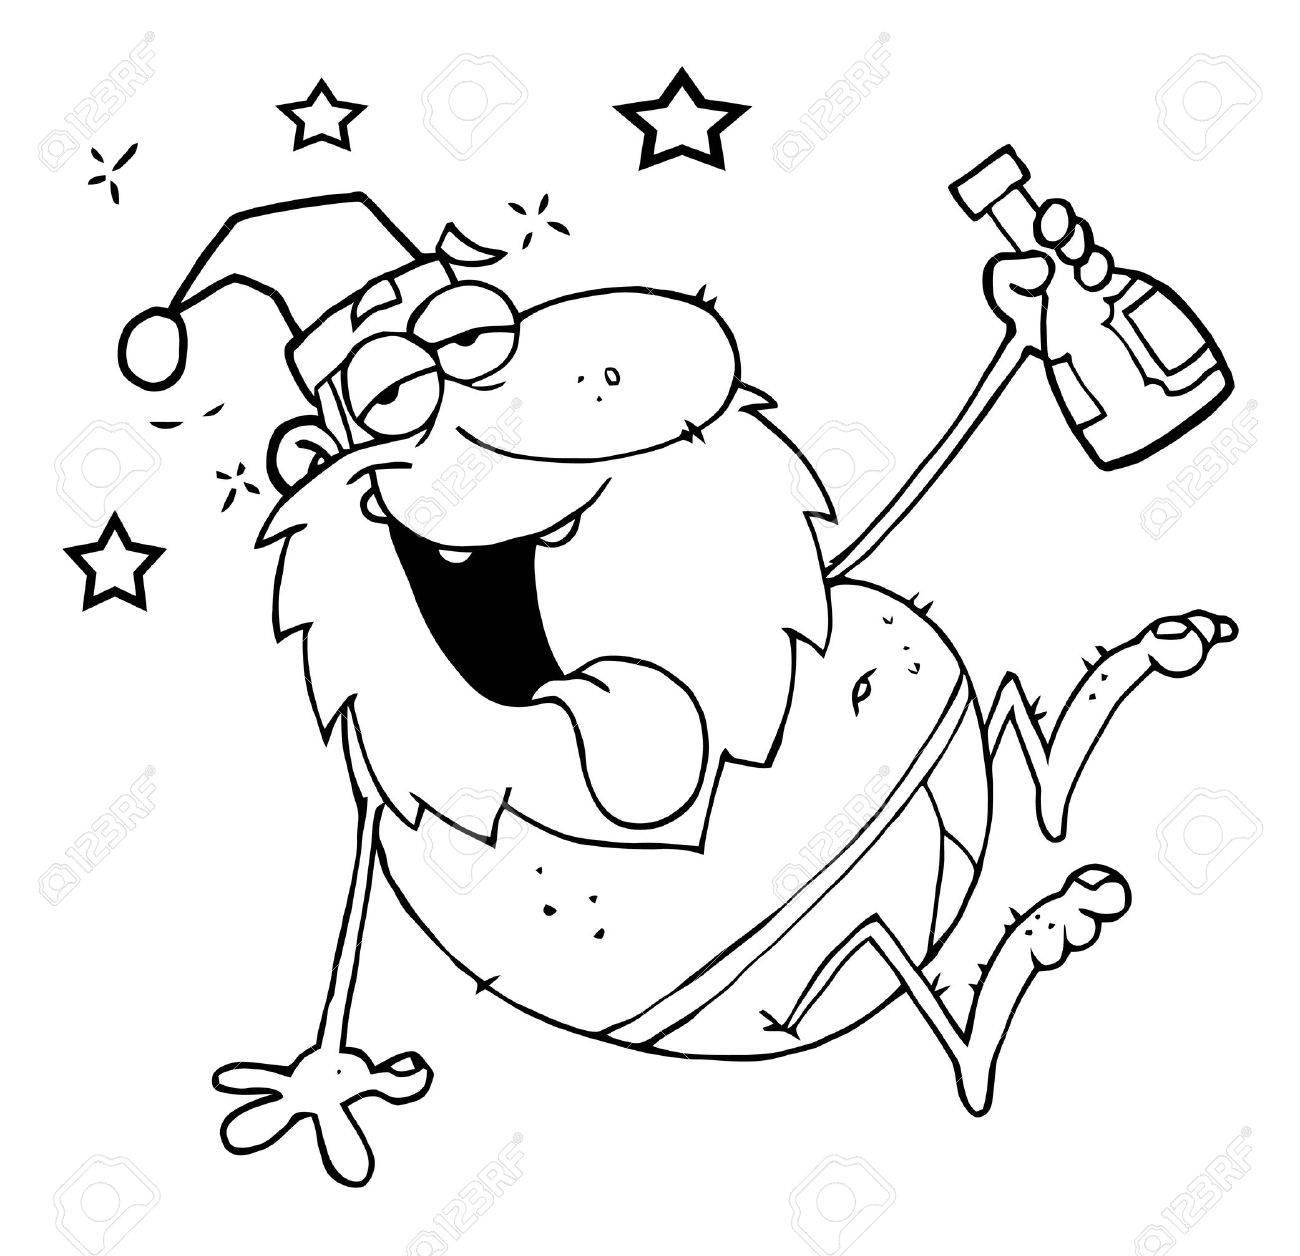 Outline Drunk Santa Clause.